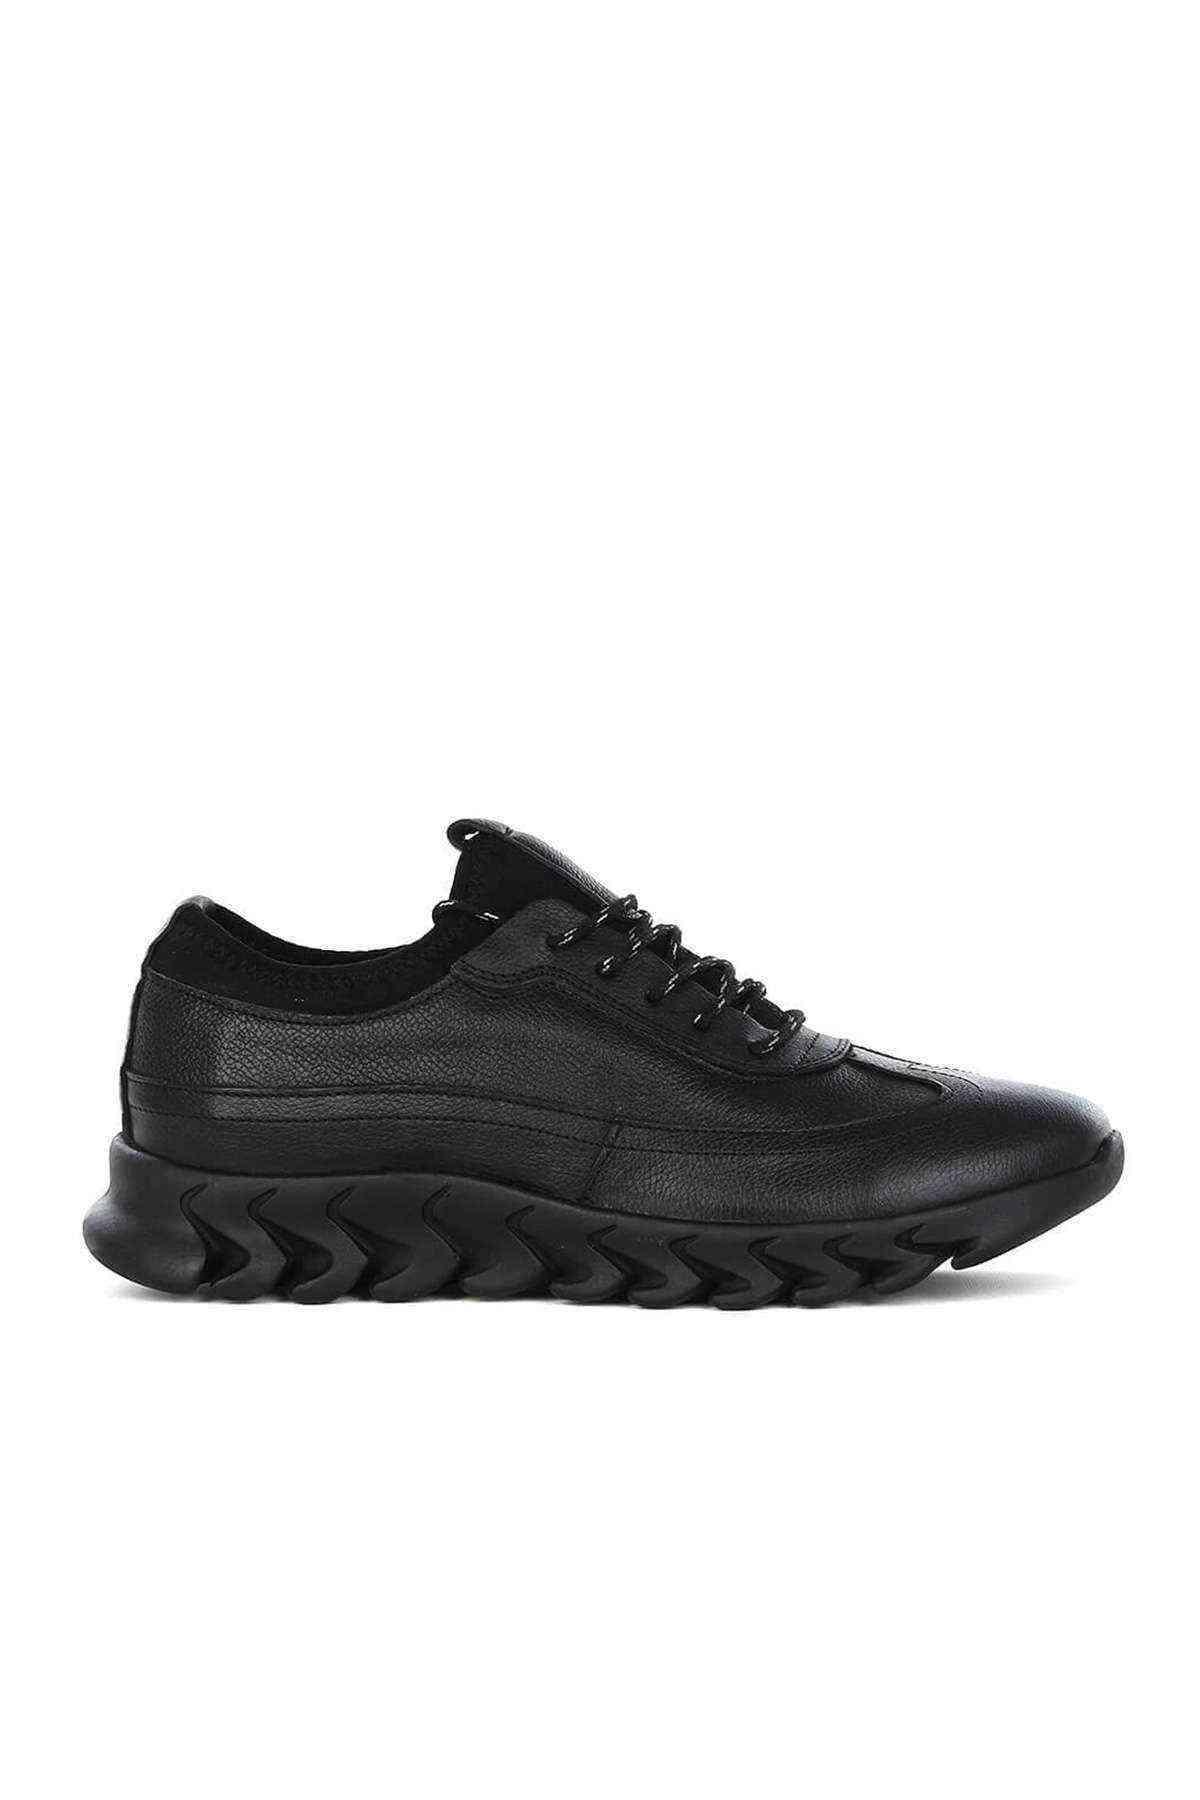 Erkek Siyah Hakiki Deri Casual Ayakkabı - Frank Peter E-782